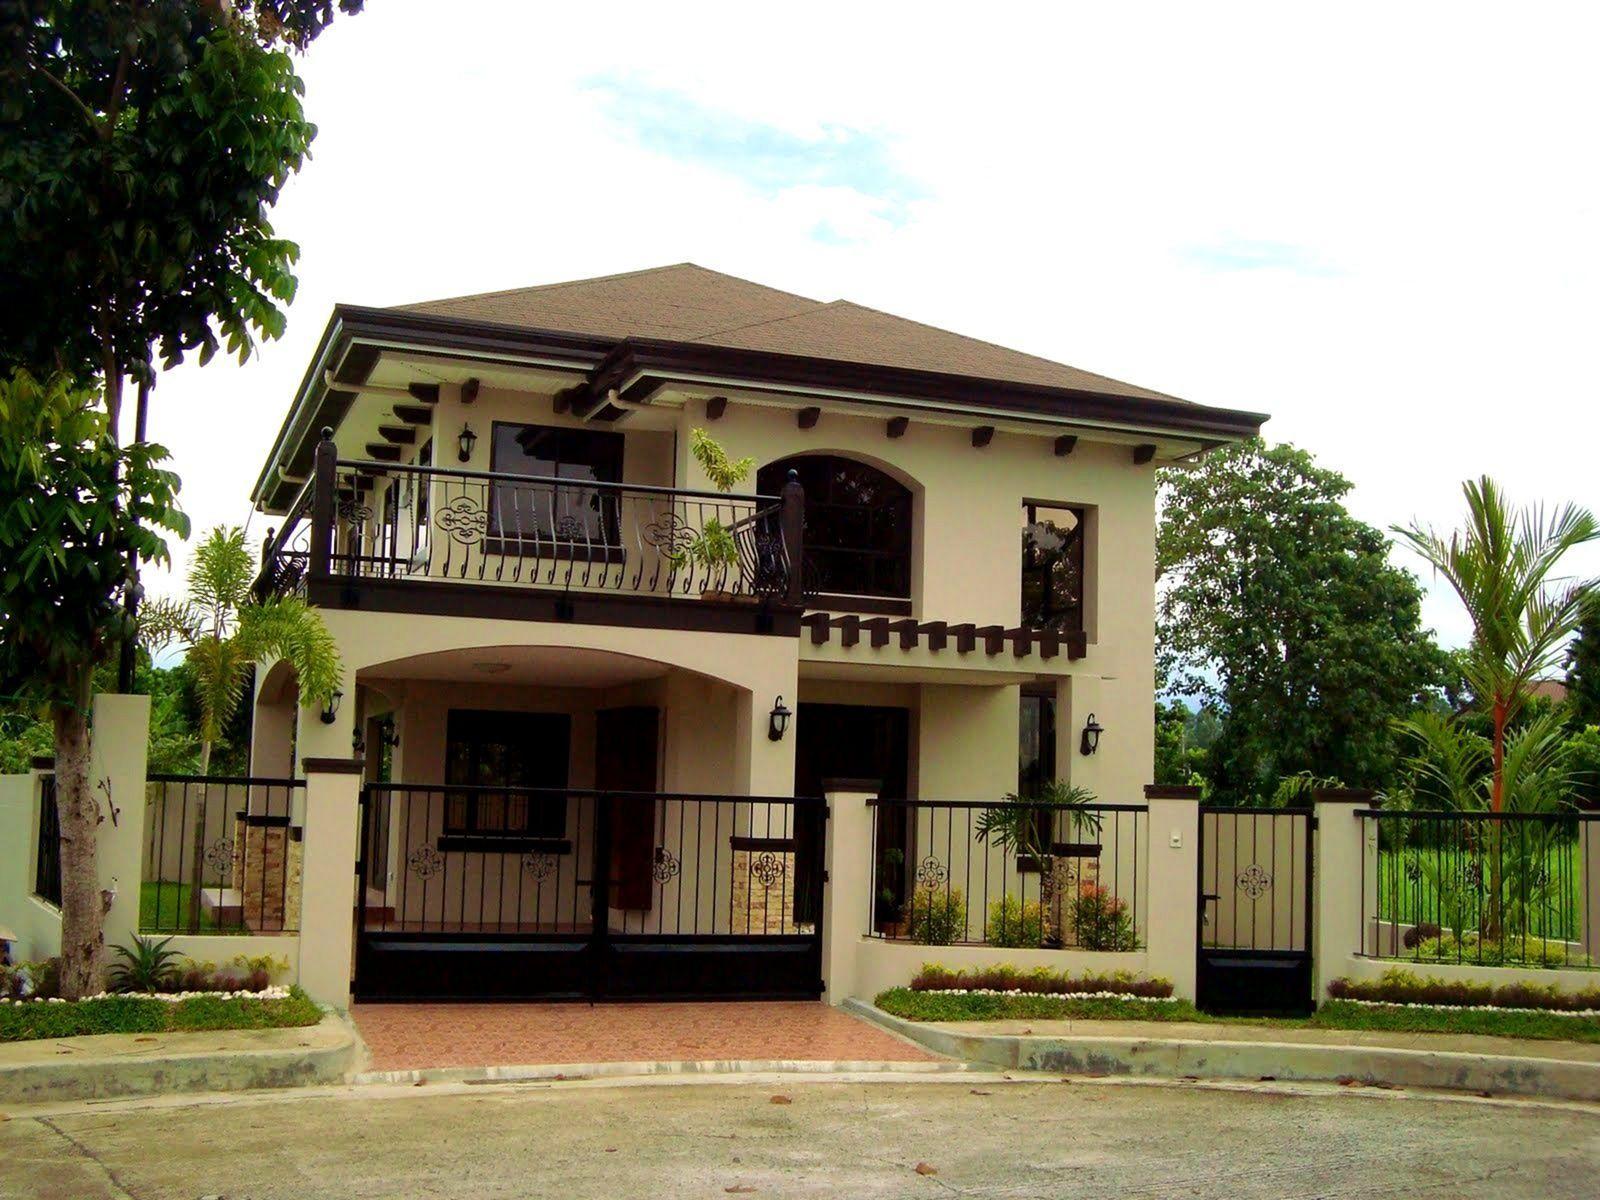 25 Fabulous Two Storey House Designs For Romantic Young Families Classic House Design 2 Storey House Design House Porch Design